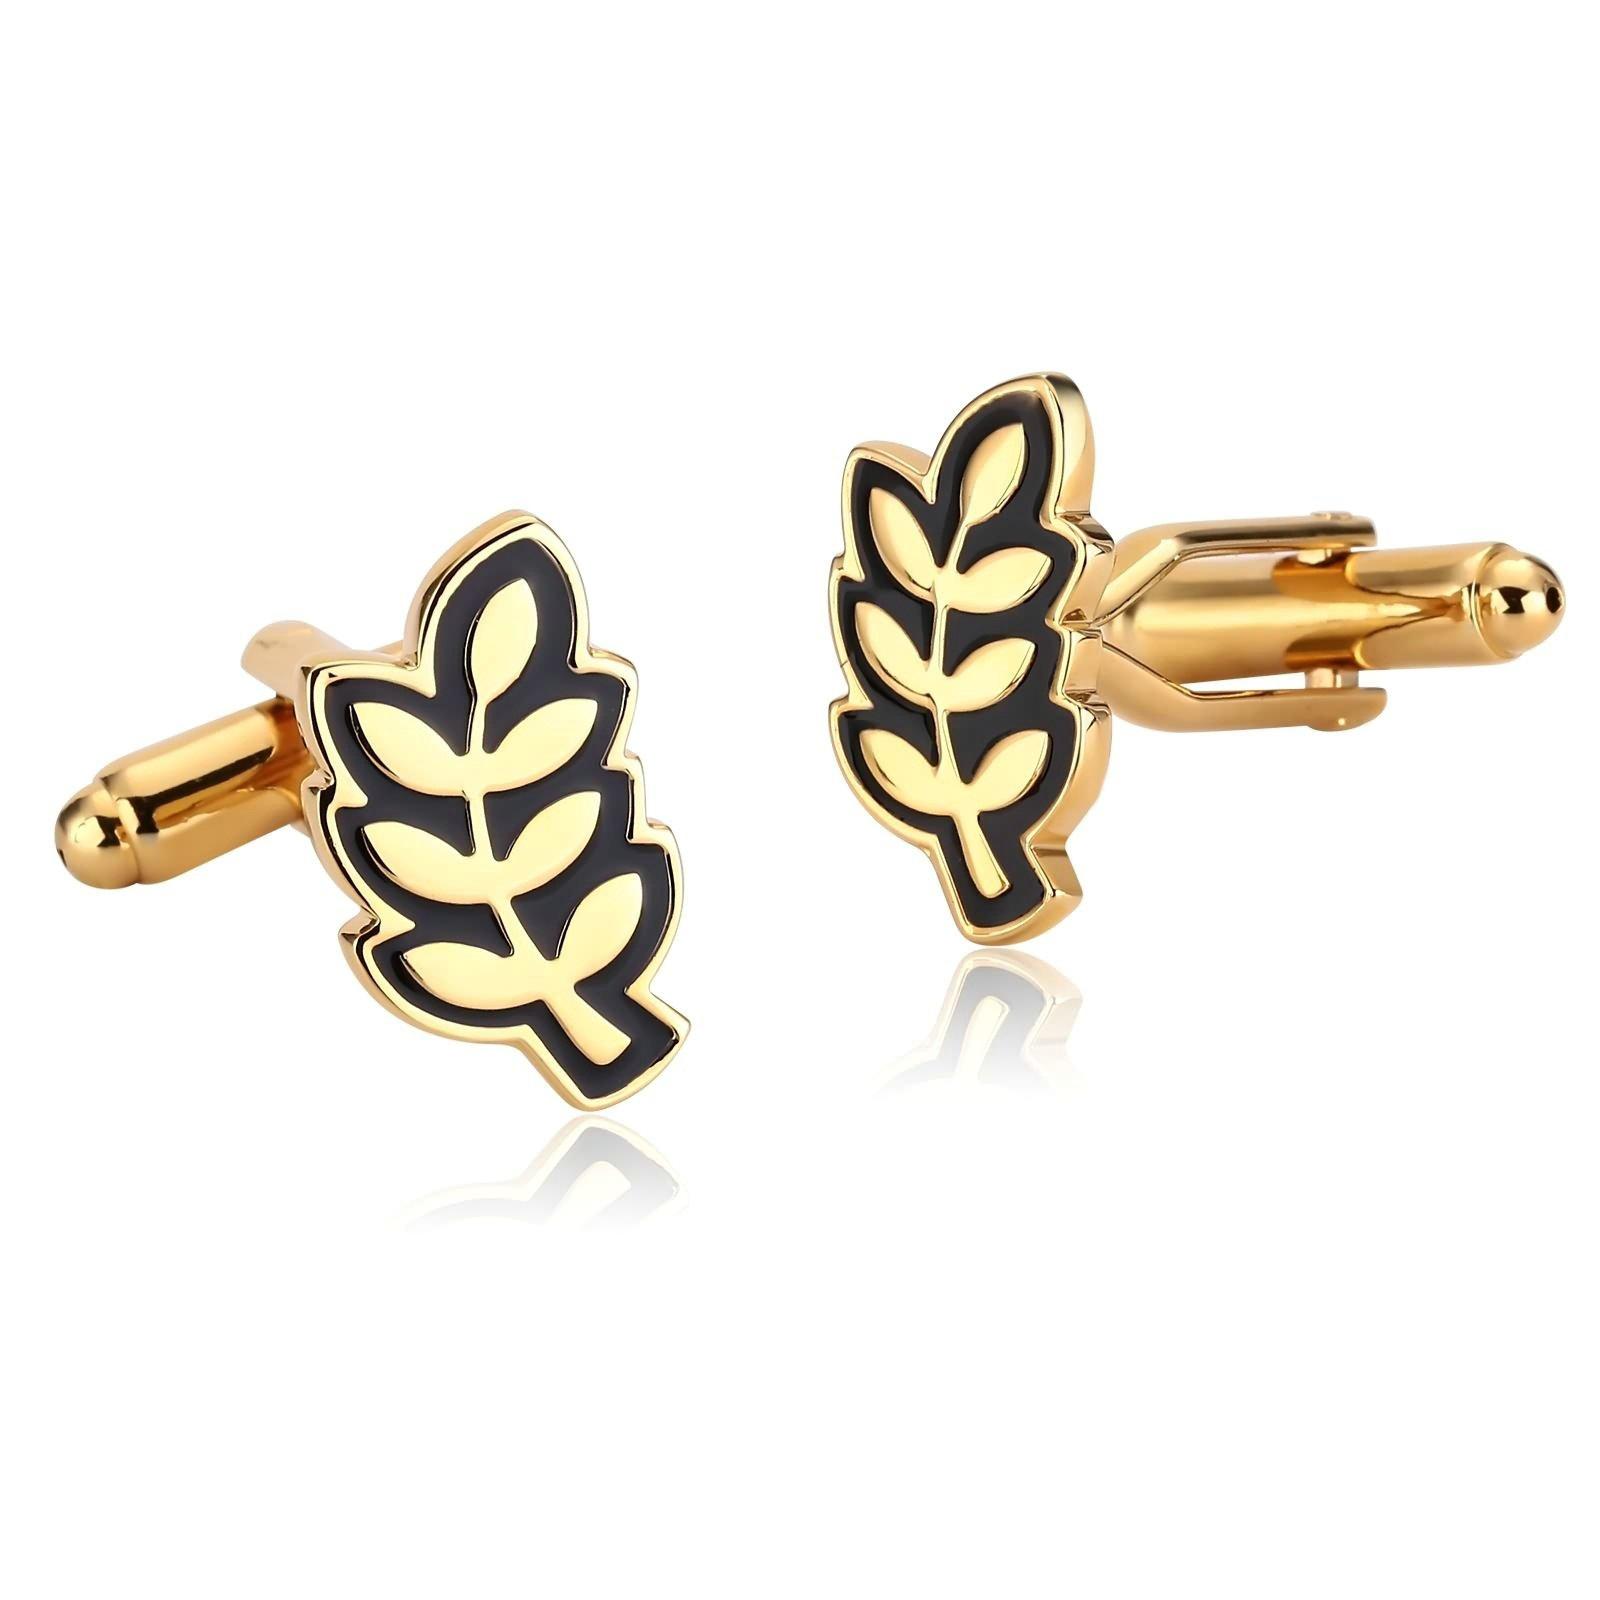 Beydodo Wedding Cufflinks for Groom Cufflinks Stainless Steel Gold Black Olive Branch